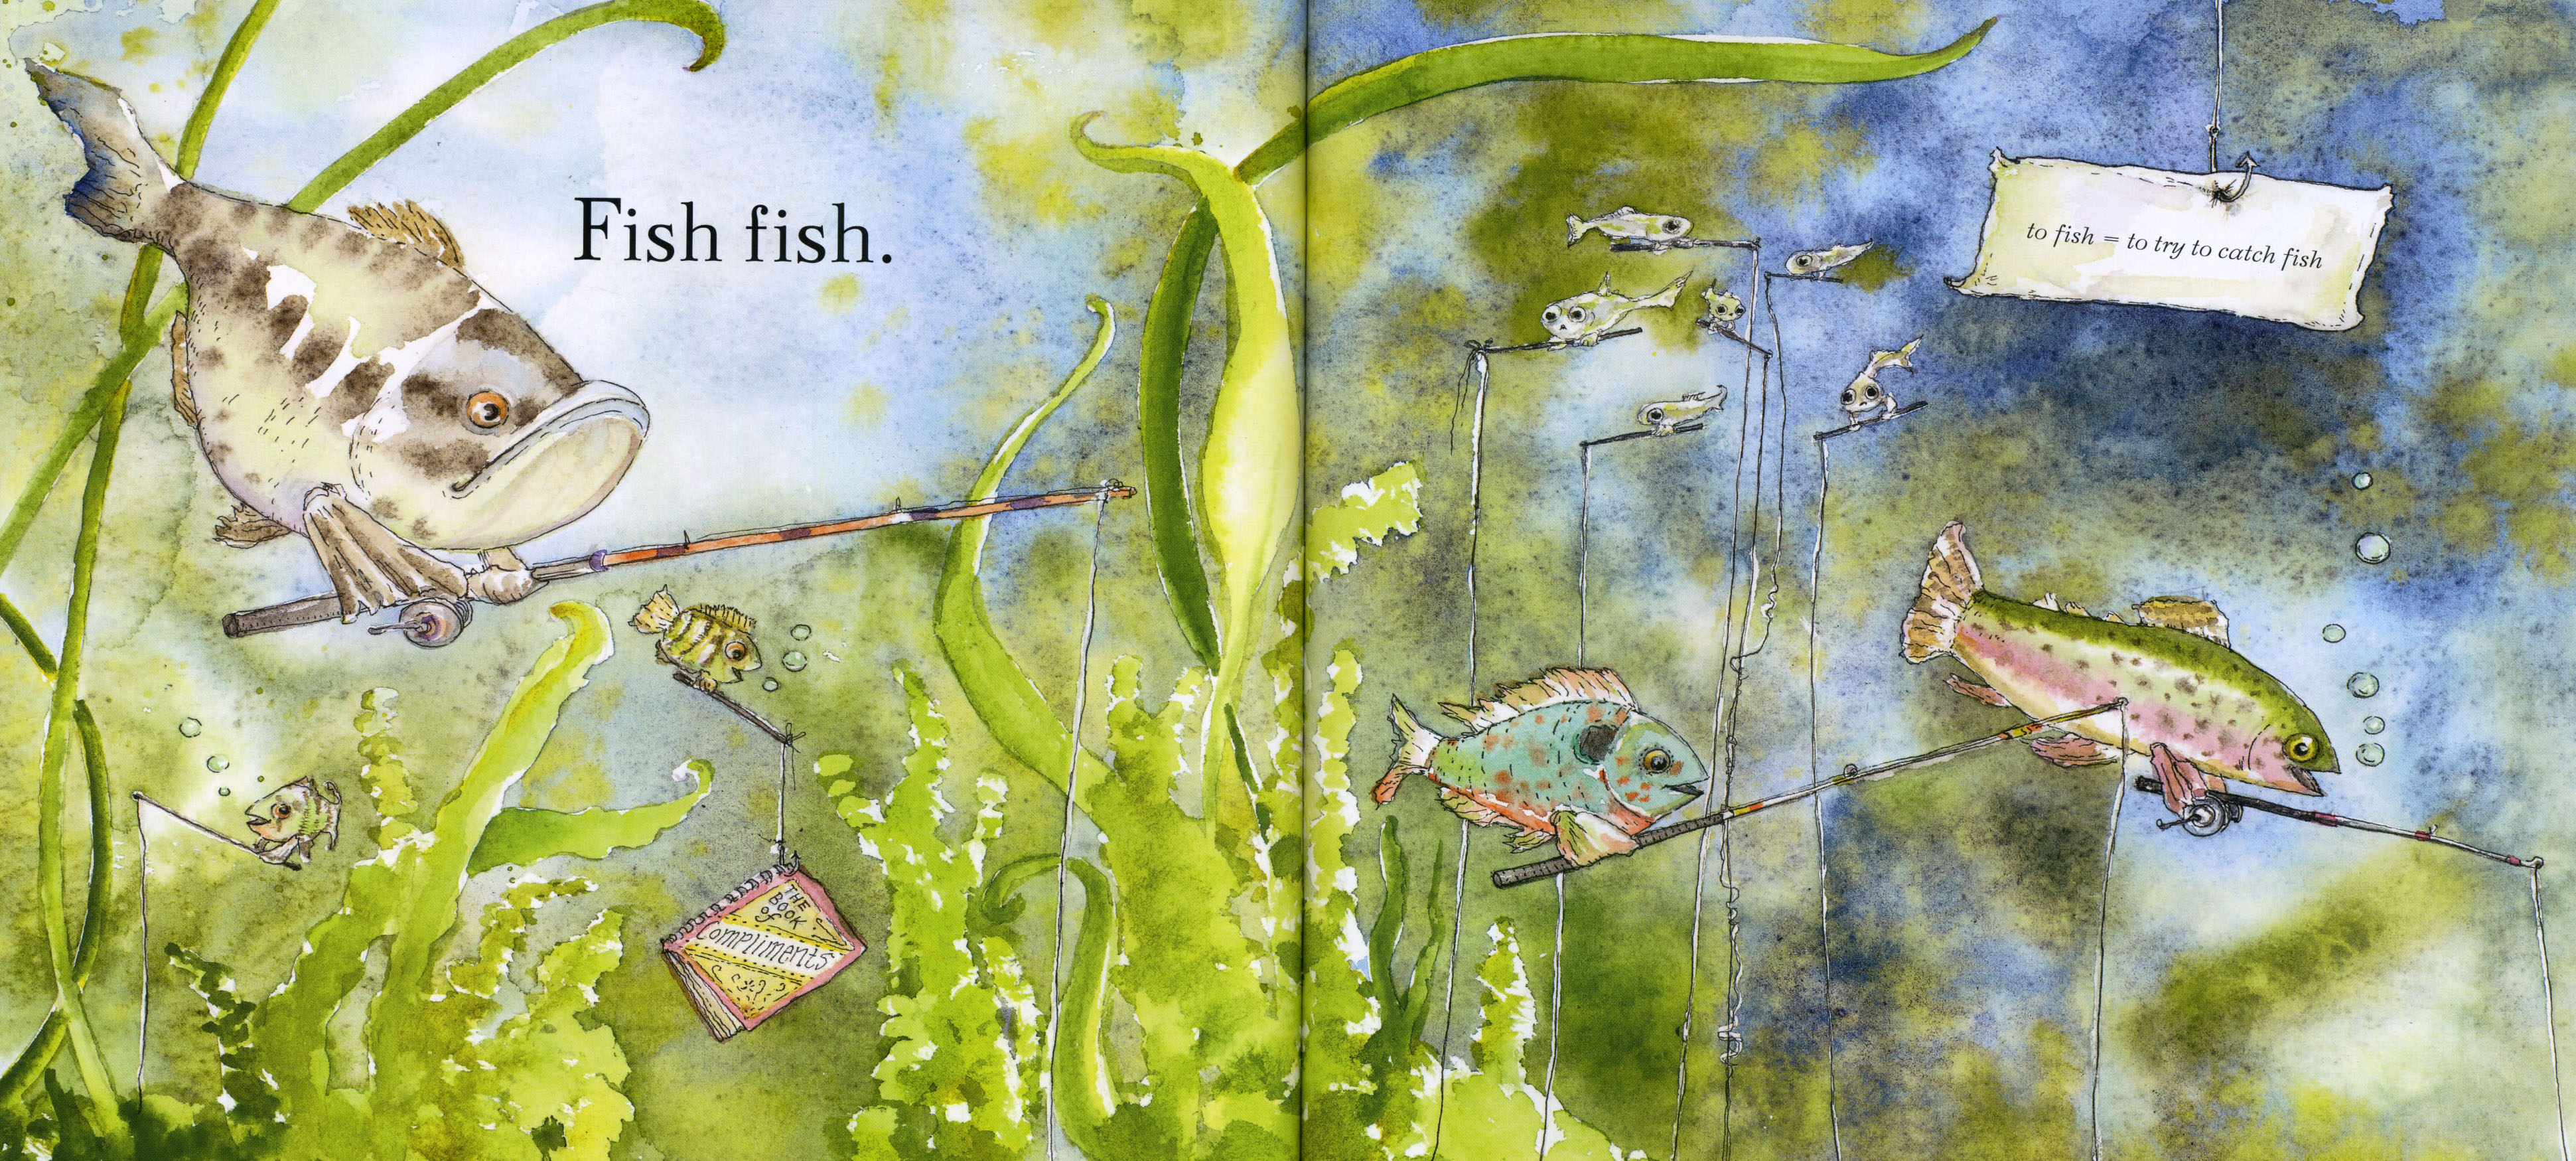 fishspreadfrombook